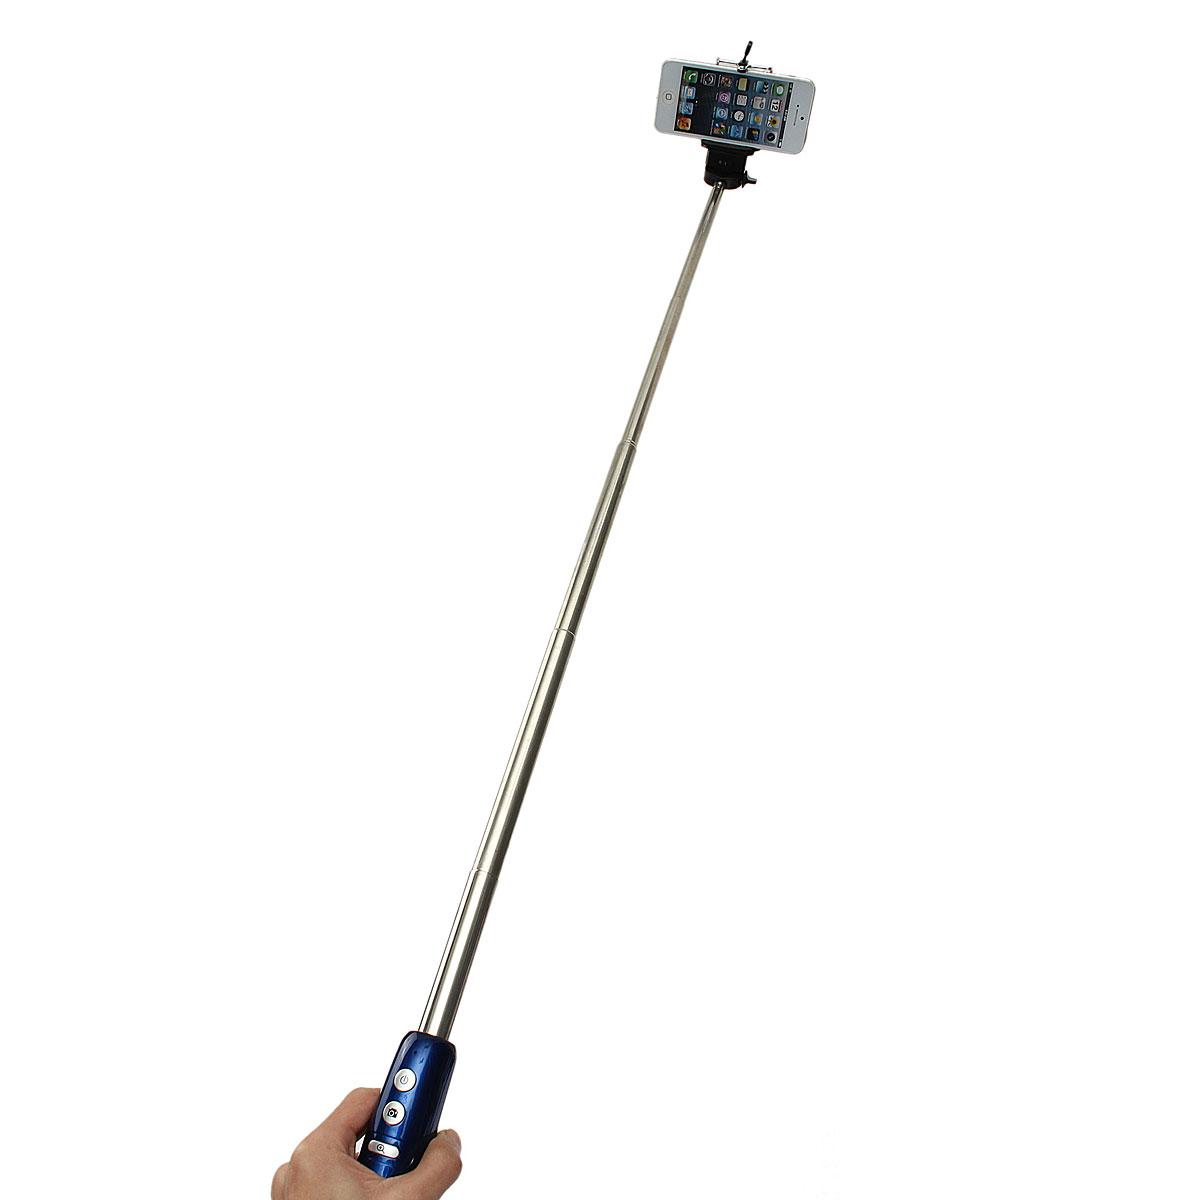 mce 25cm bluetooth shutter monopod stick for iphone samsung galaxy nexus htc sony lg blue. Black Bedroom Furniture Sets. Home Design Ideas